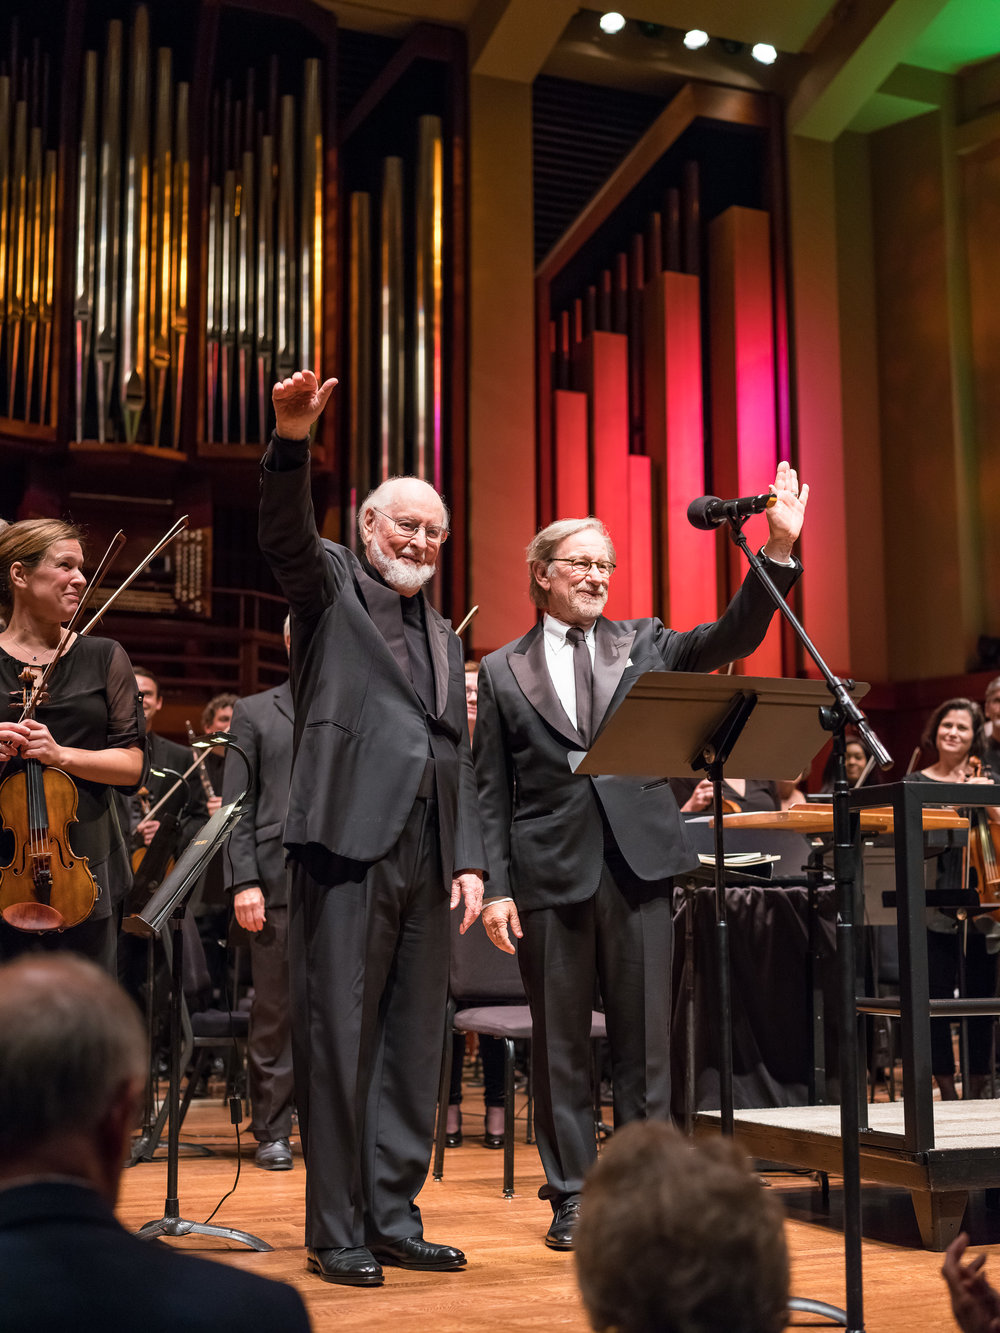 brandon_patoc_john_williams_Steven_Spielberg, Seattle_Symphony_Orchestra_Conert_0060.JPG